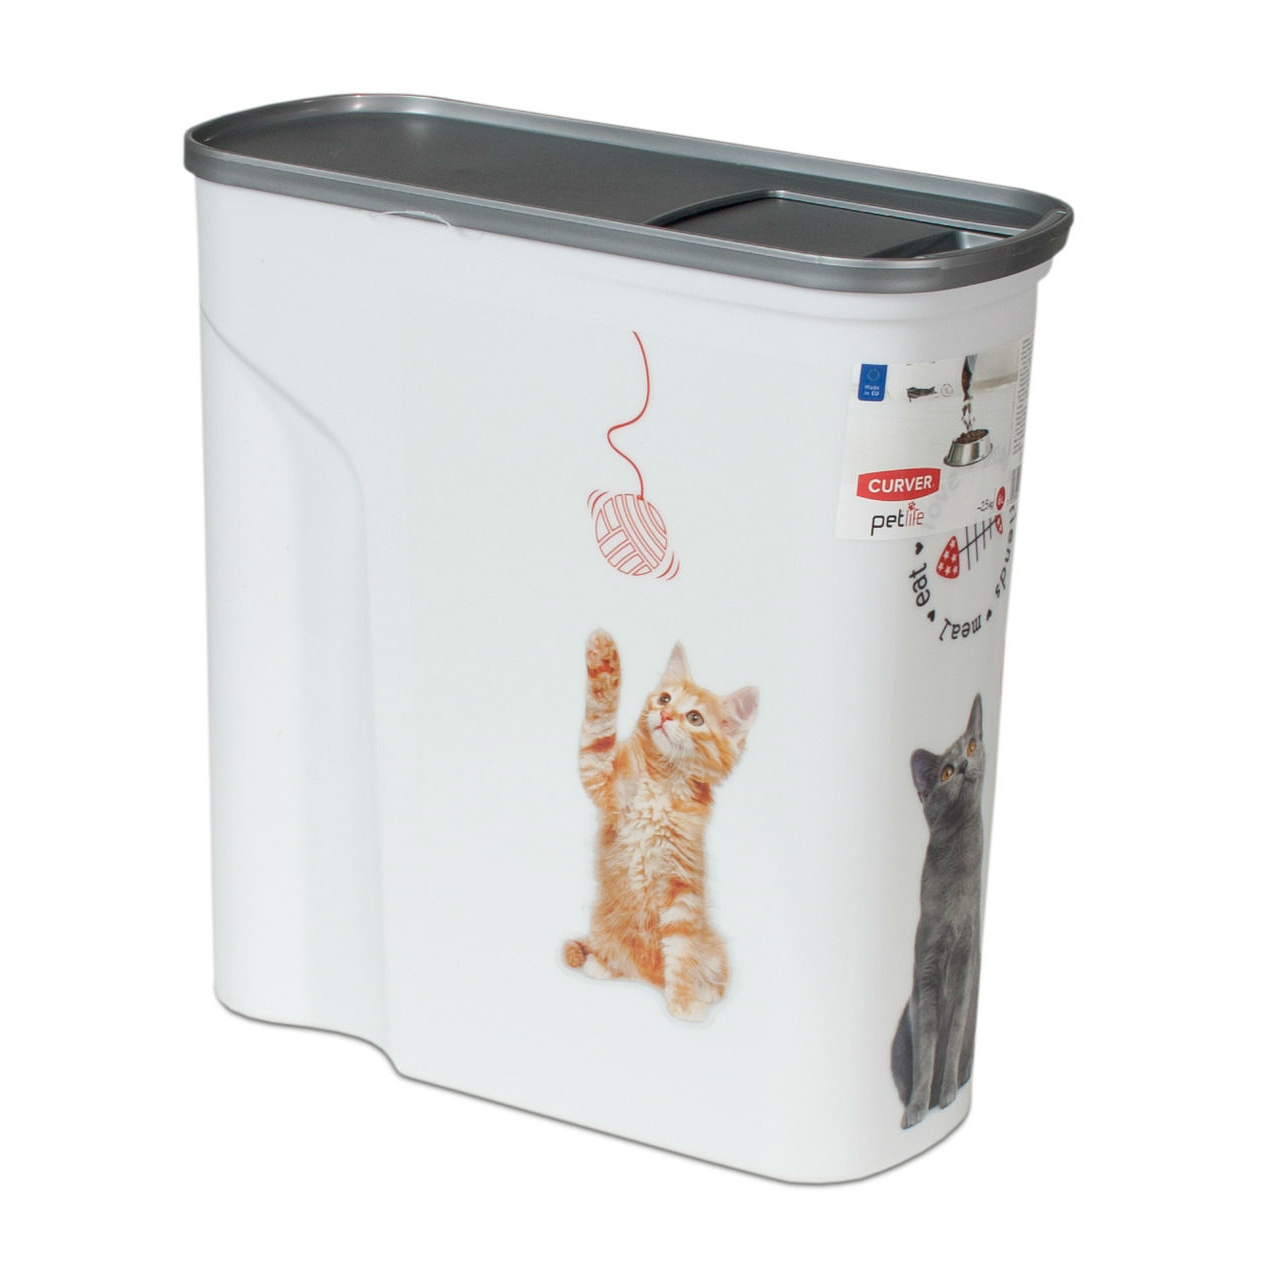 Curver Futtercontainer Katze, Bild 4